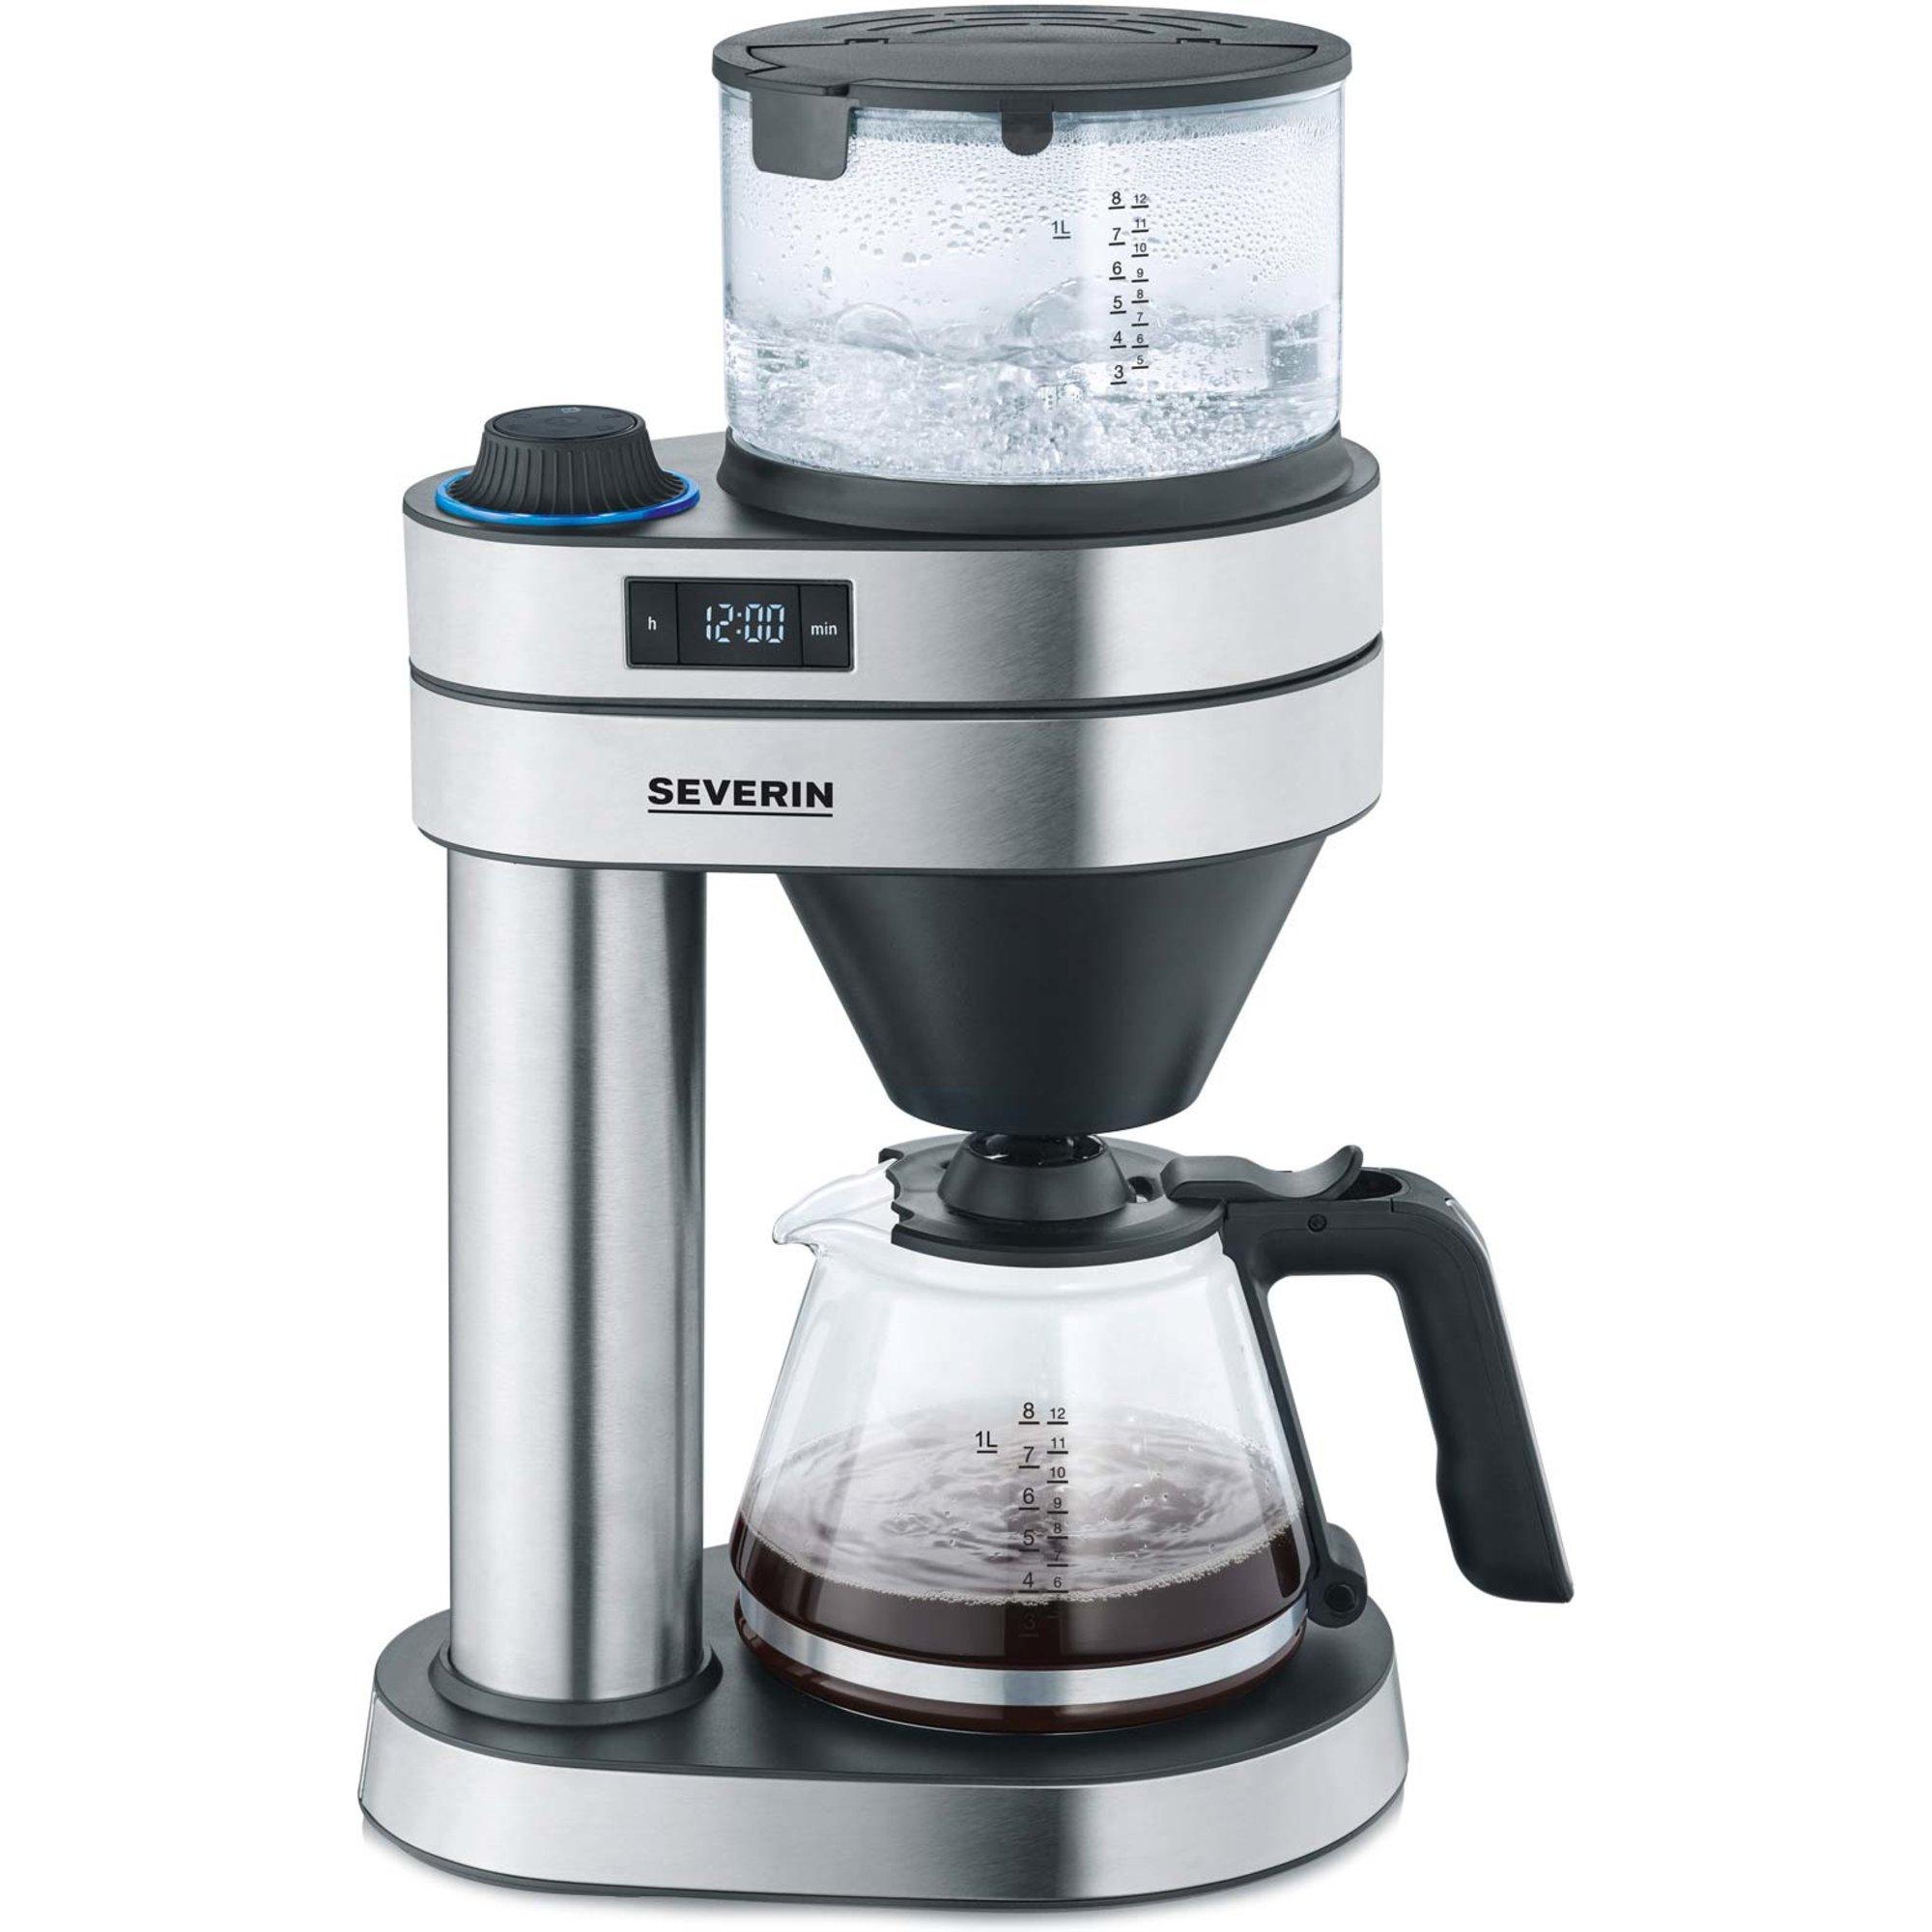 Bild av Severin Café Caprice 2.0 kaffemaskin